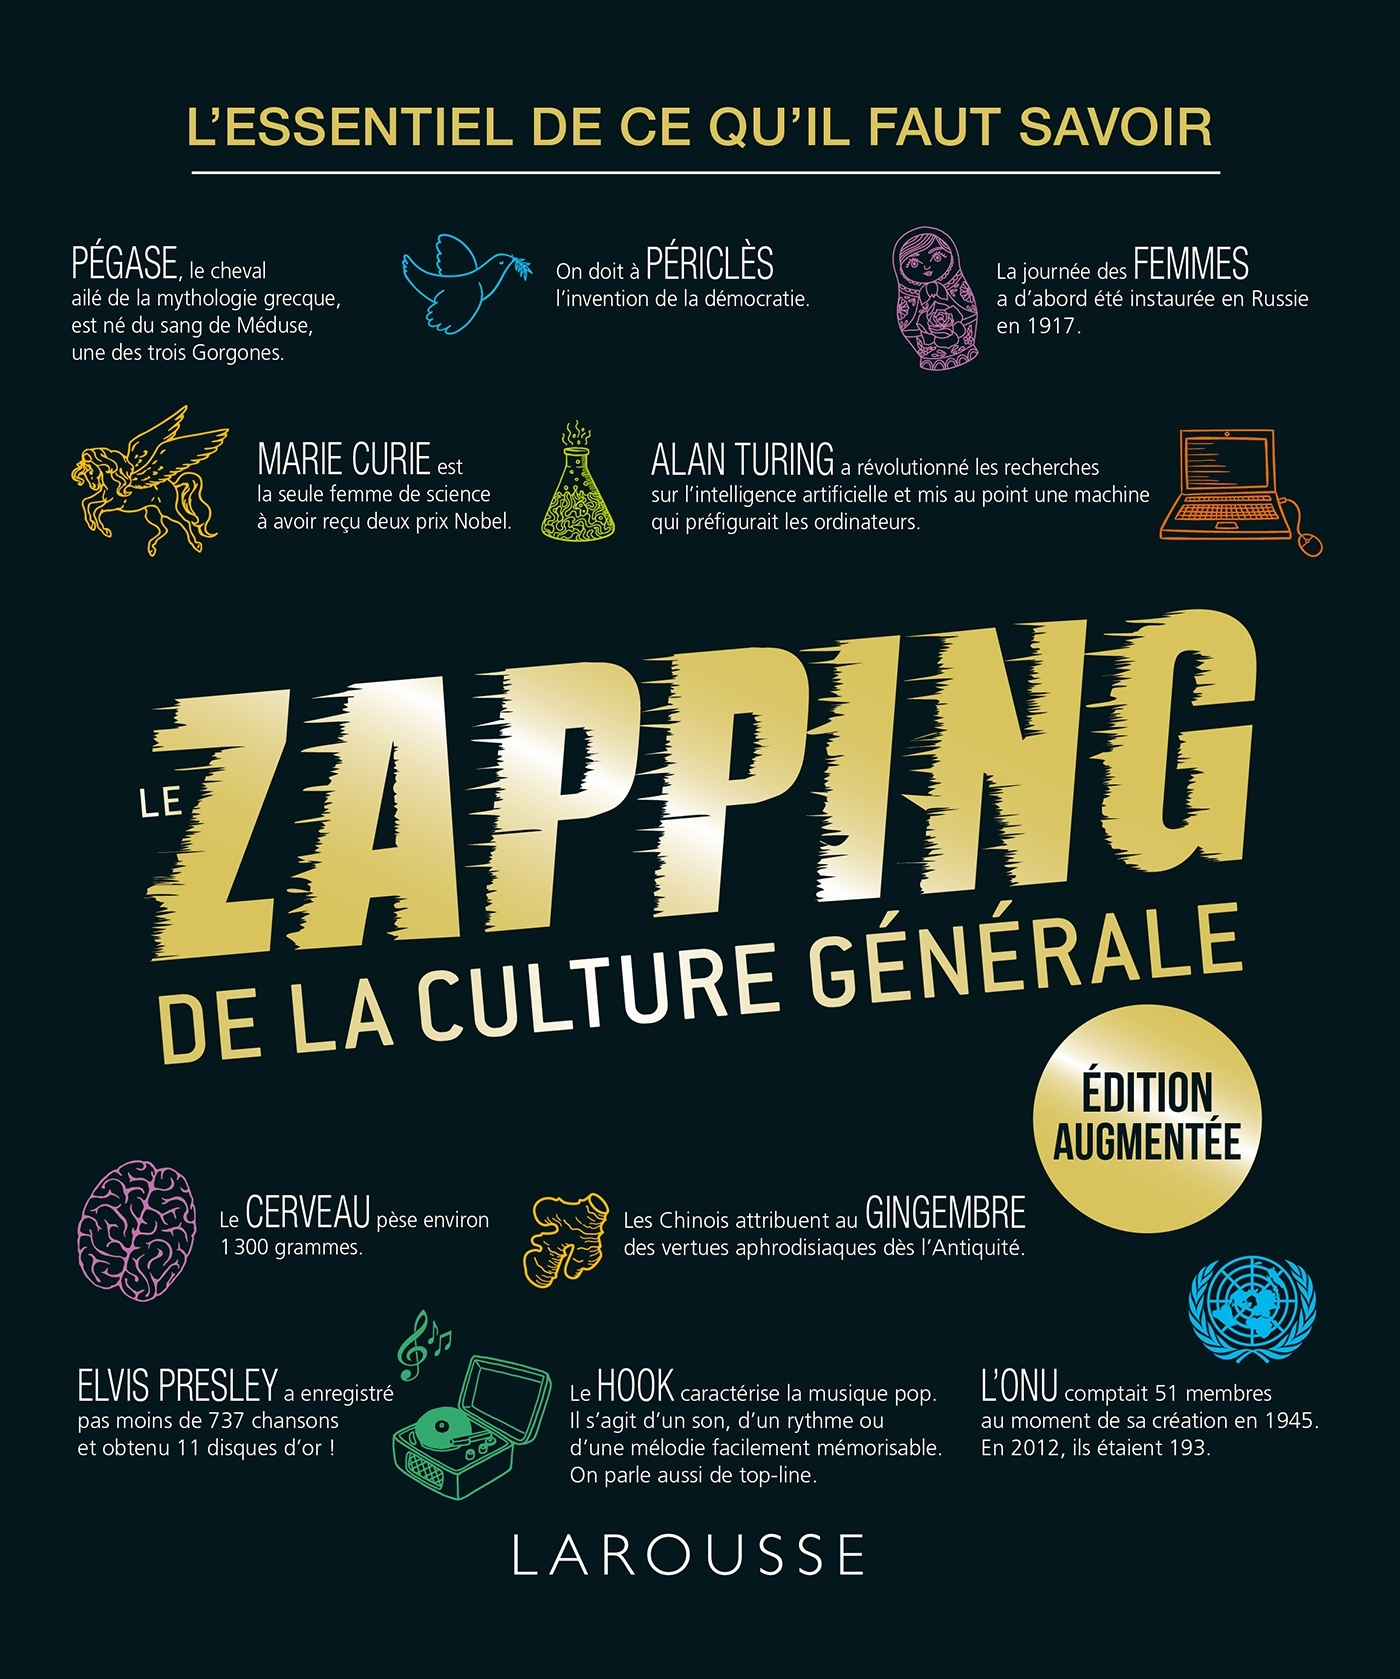 LE ZAPPING DE LA CULTURE GENERALE